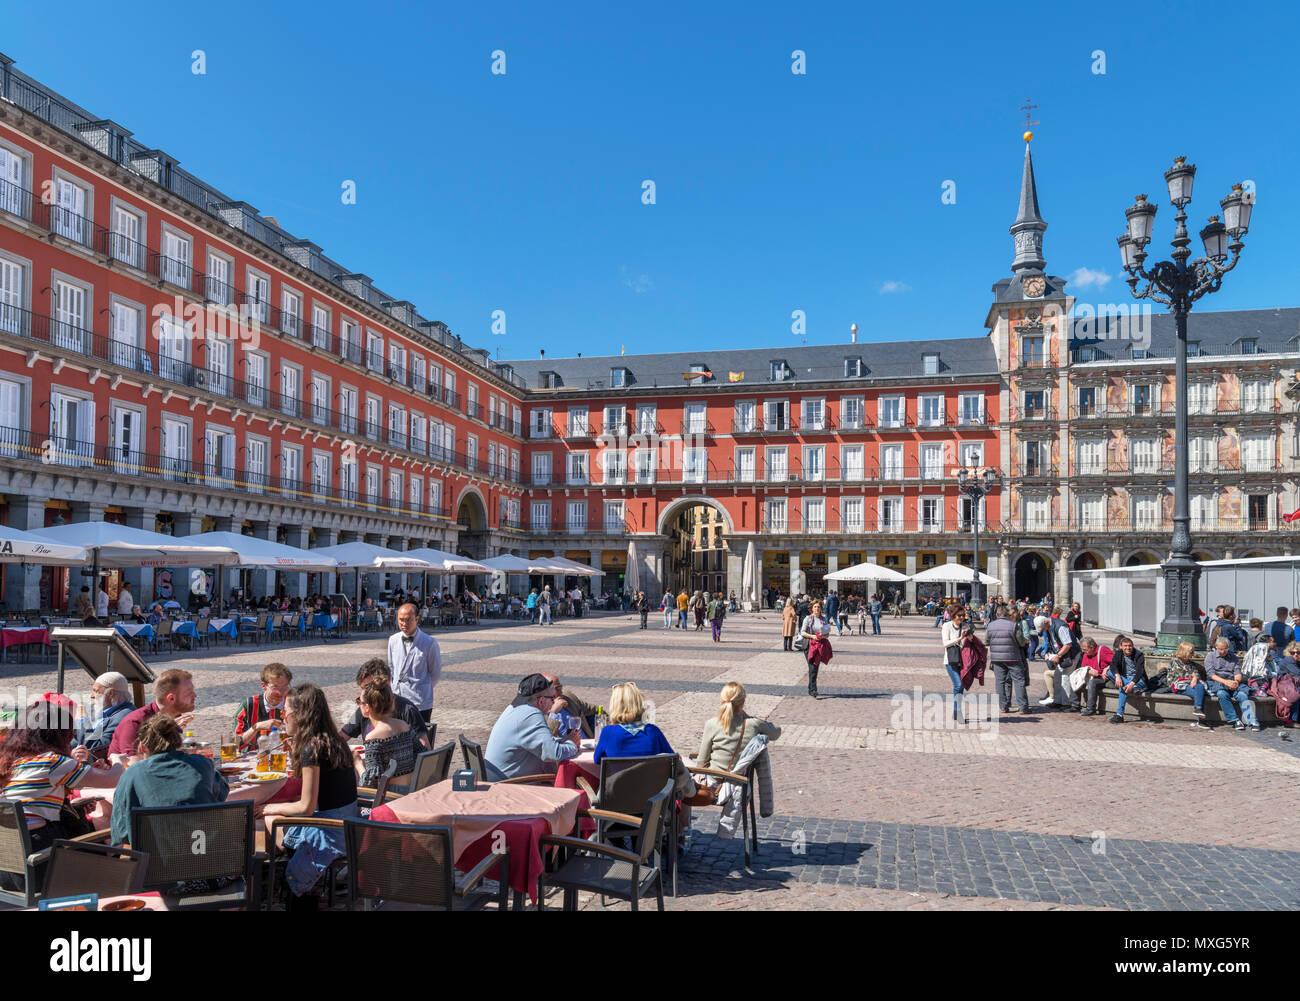 Caffè e ristoranti su Plaza Mayor, Madrid, Spagna Immagini Stock